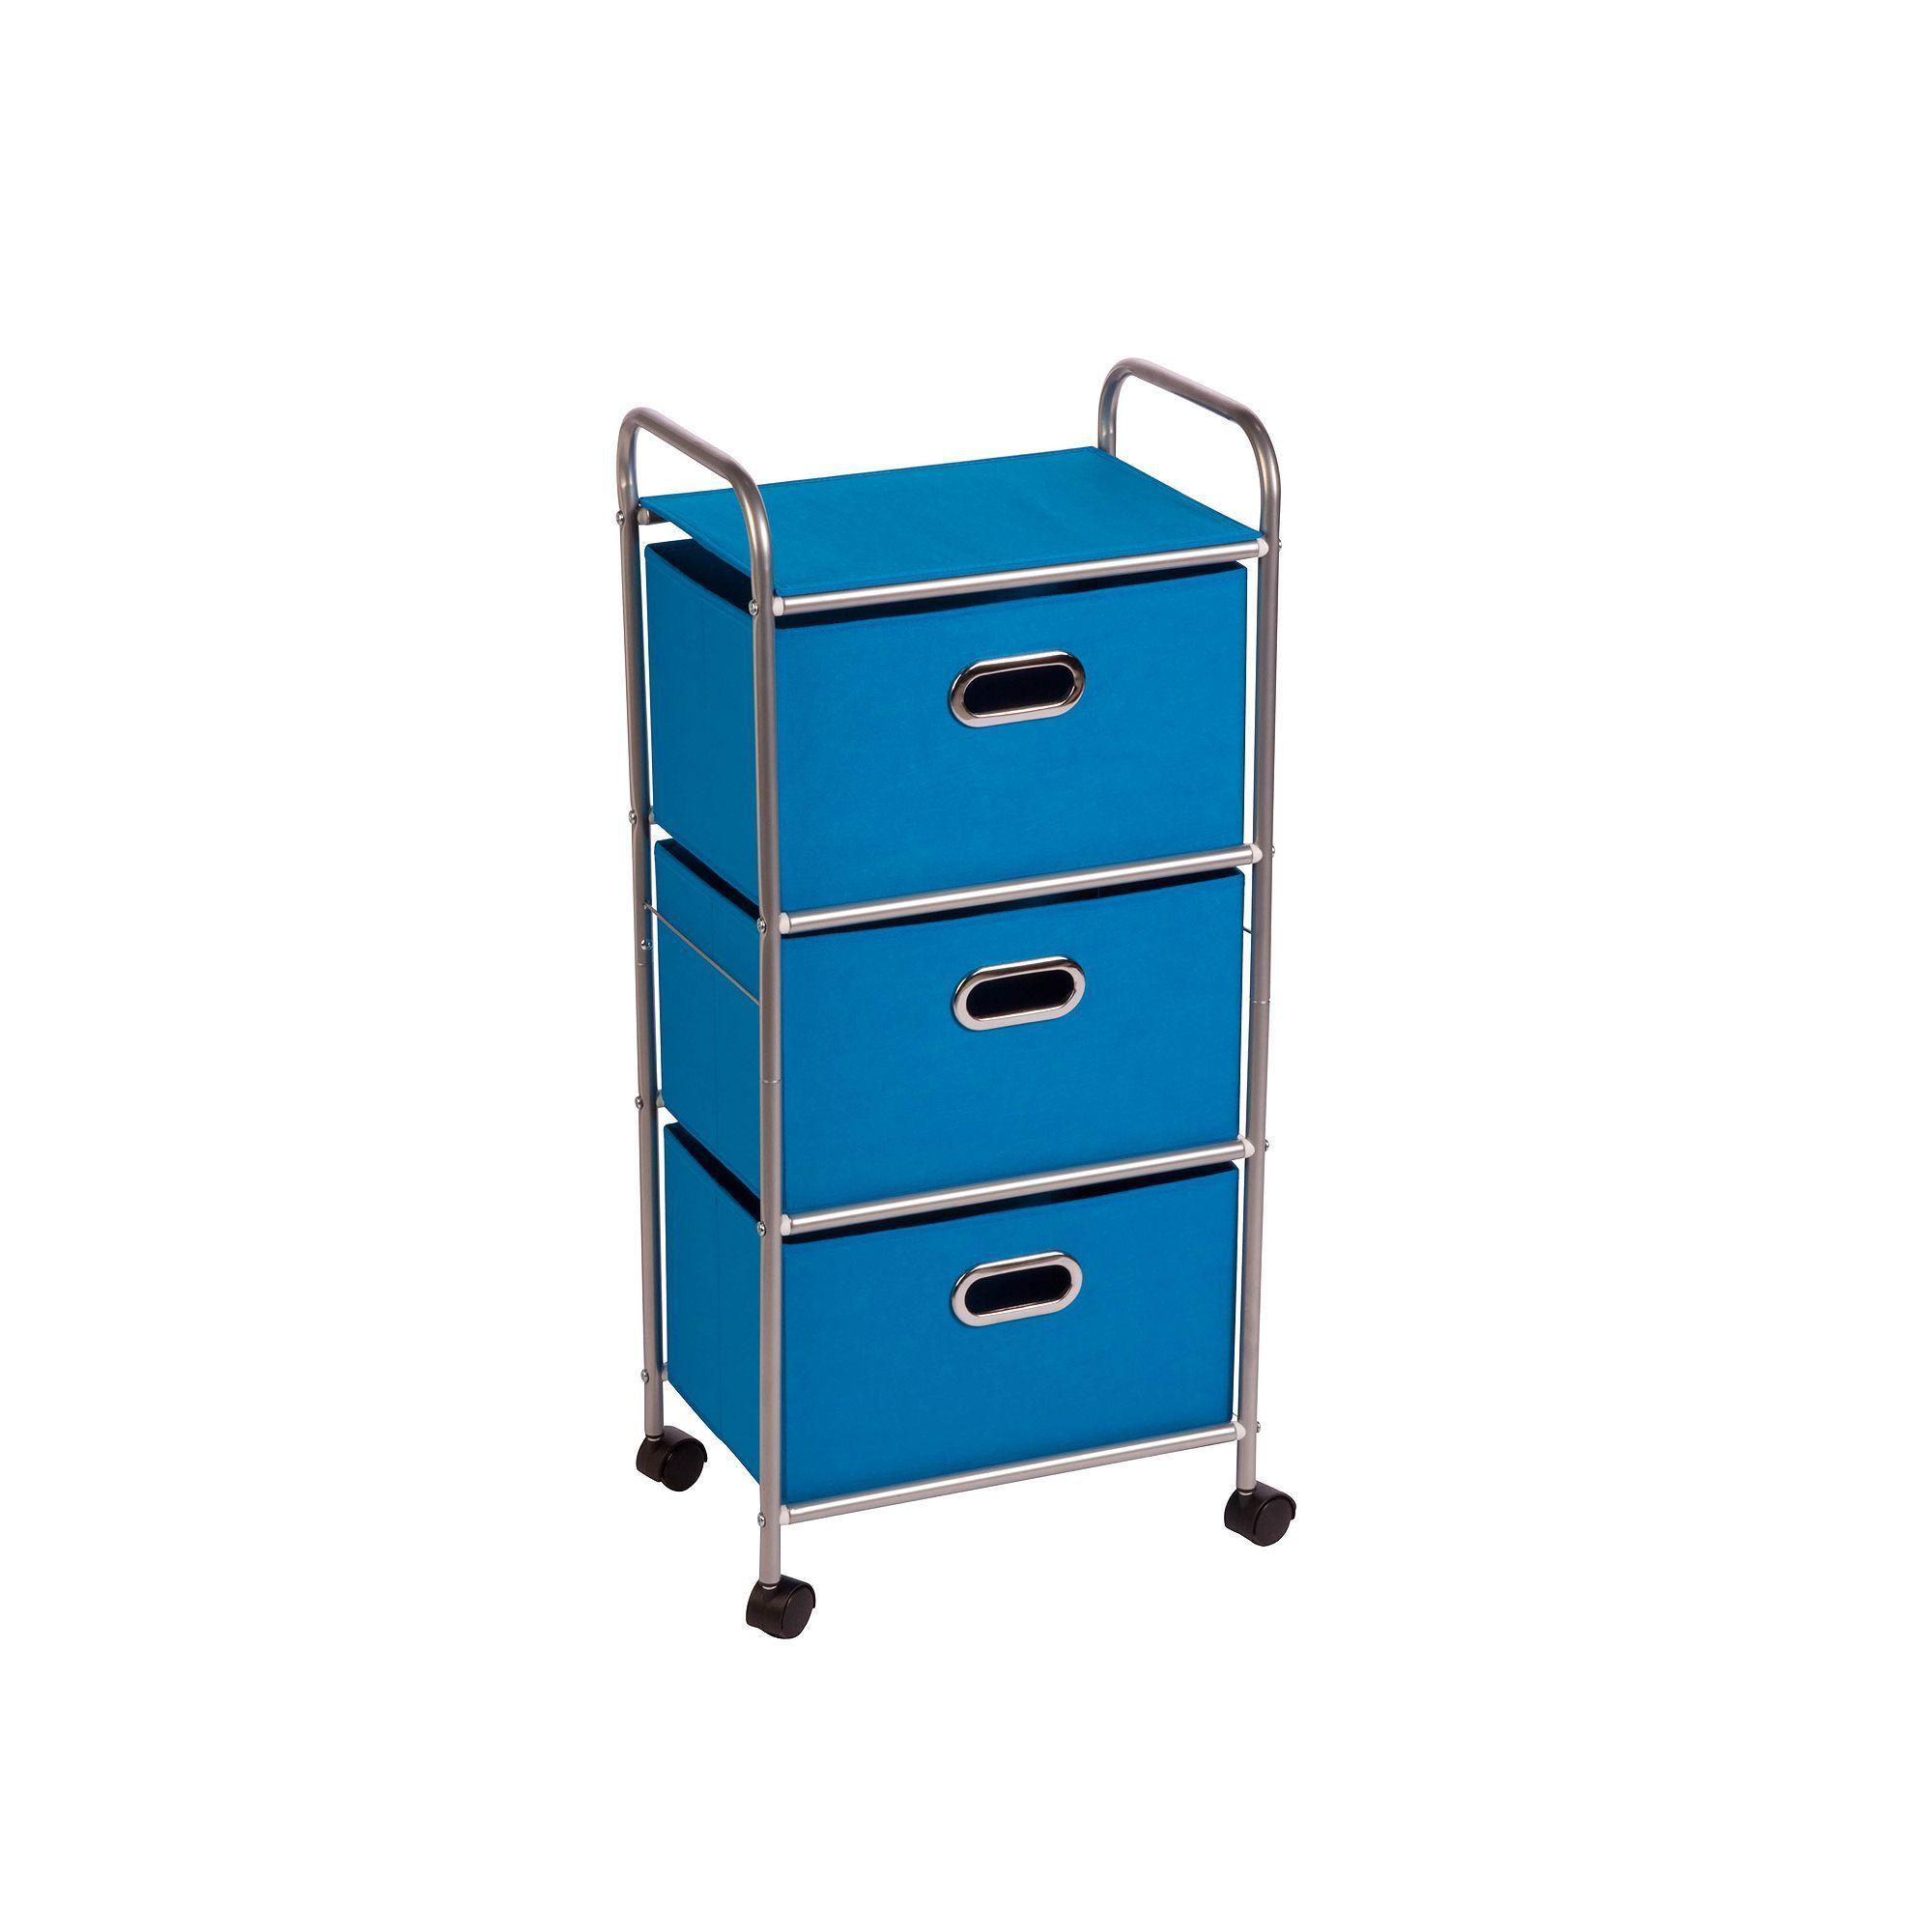 wid spin black qlt organizer storage prod iris with p top drawers hei drawer cart